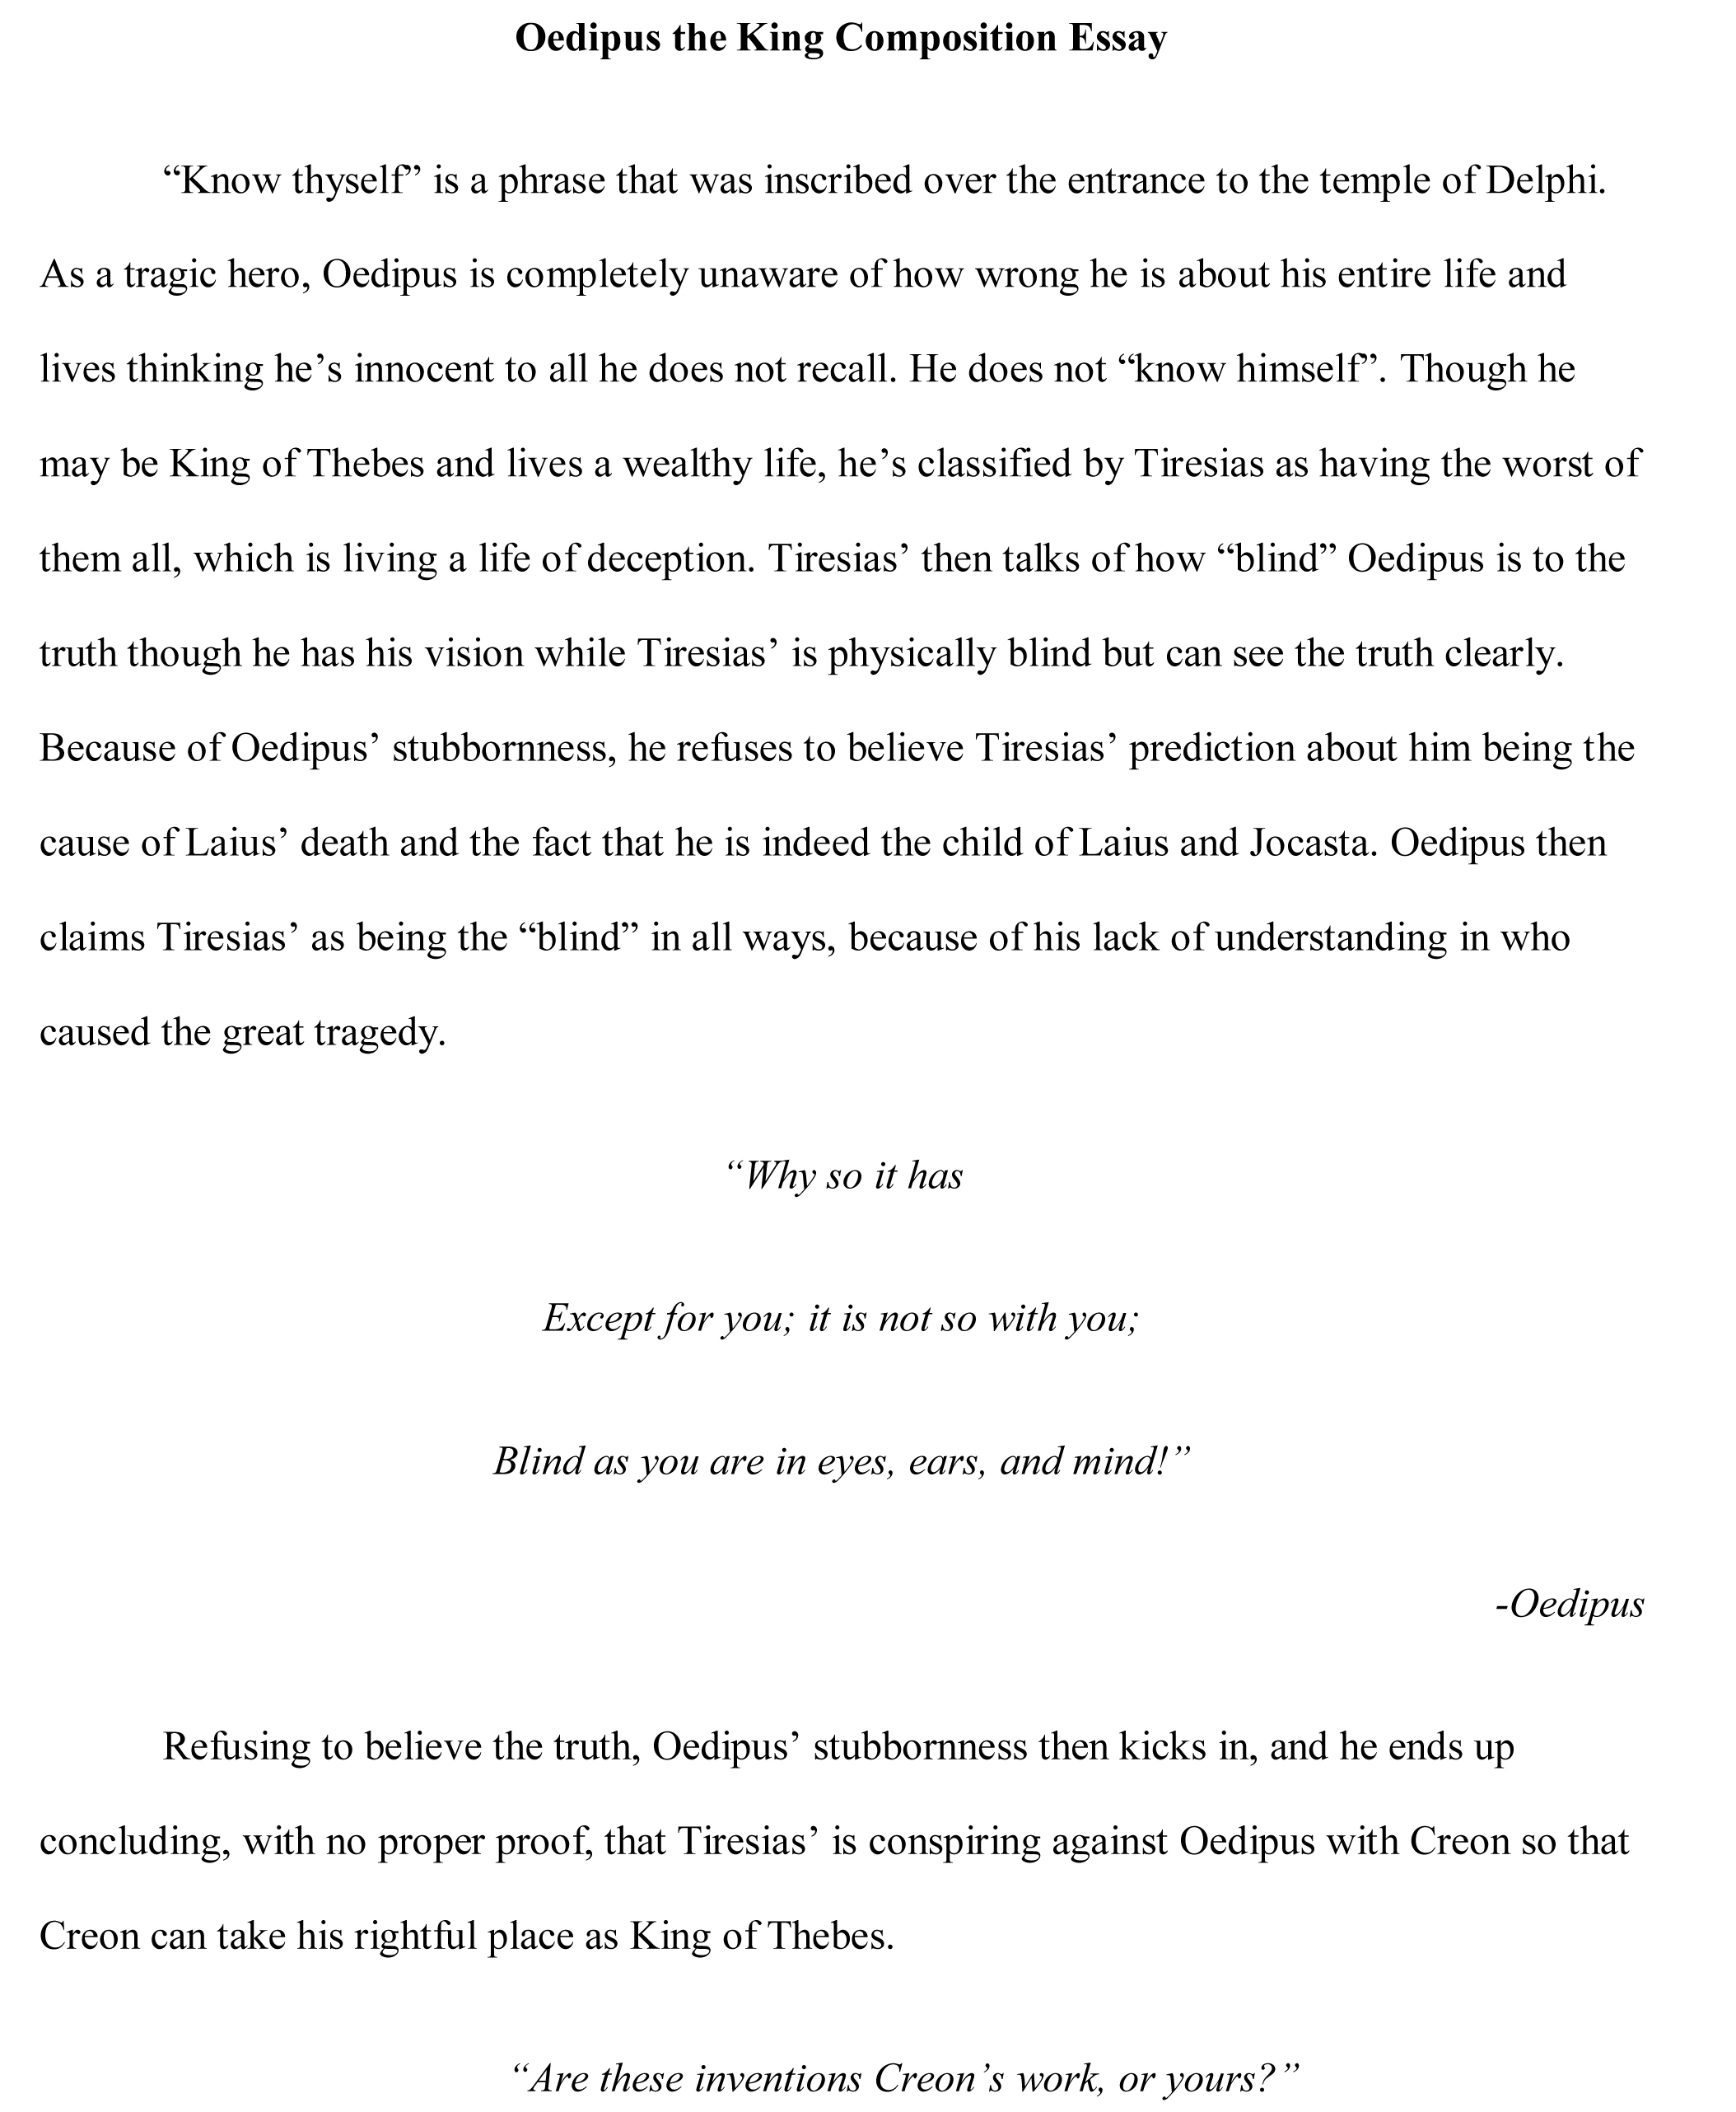 019 Macbeth Tragic Hero Essay Oedipus Free Sample Stunning Introduction Conclusion Pdf Full